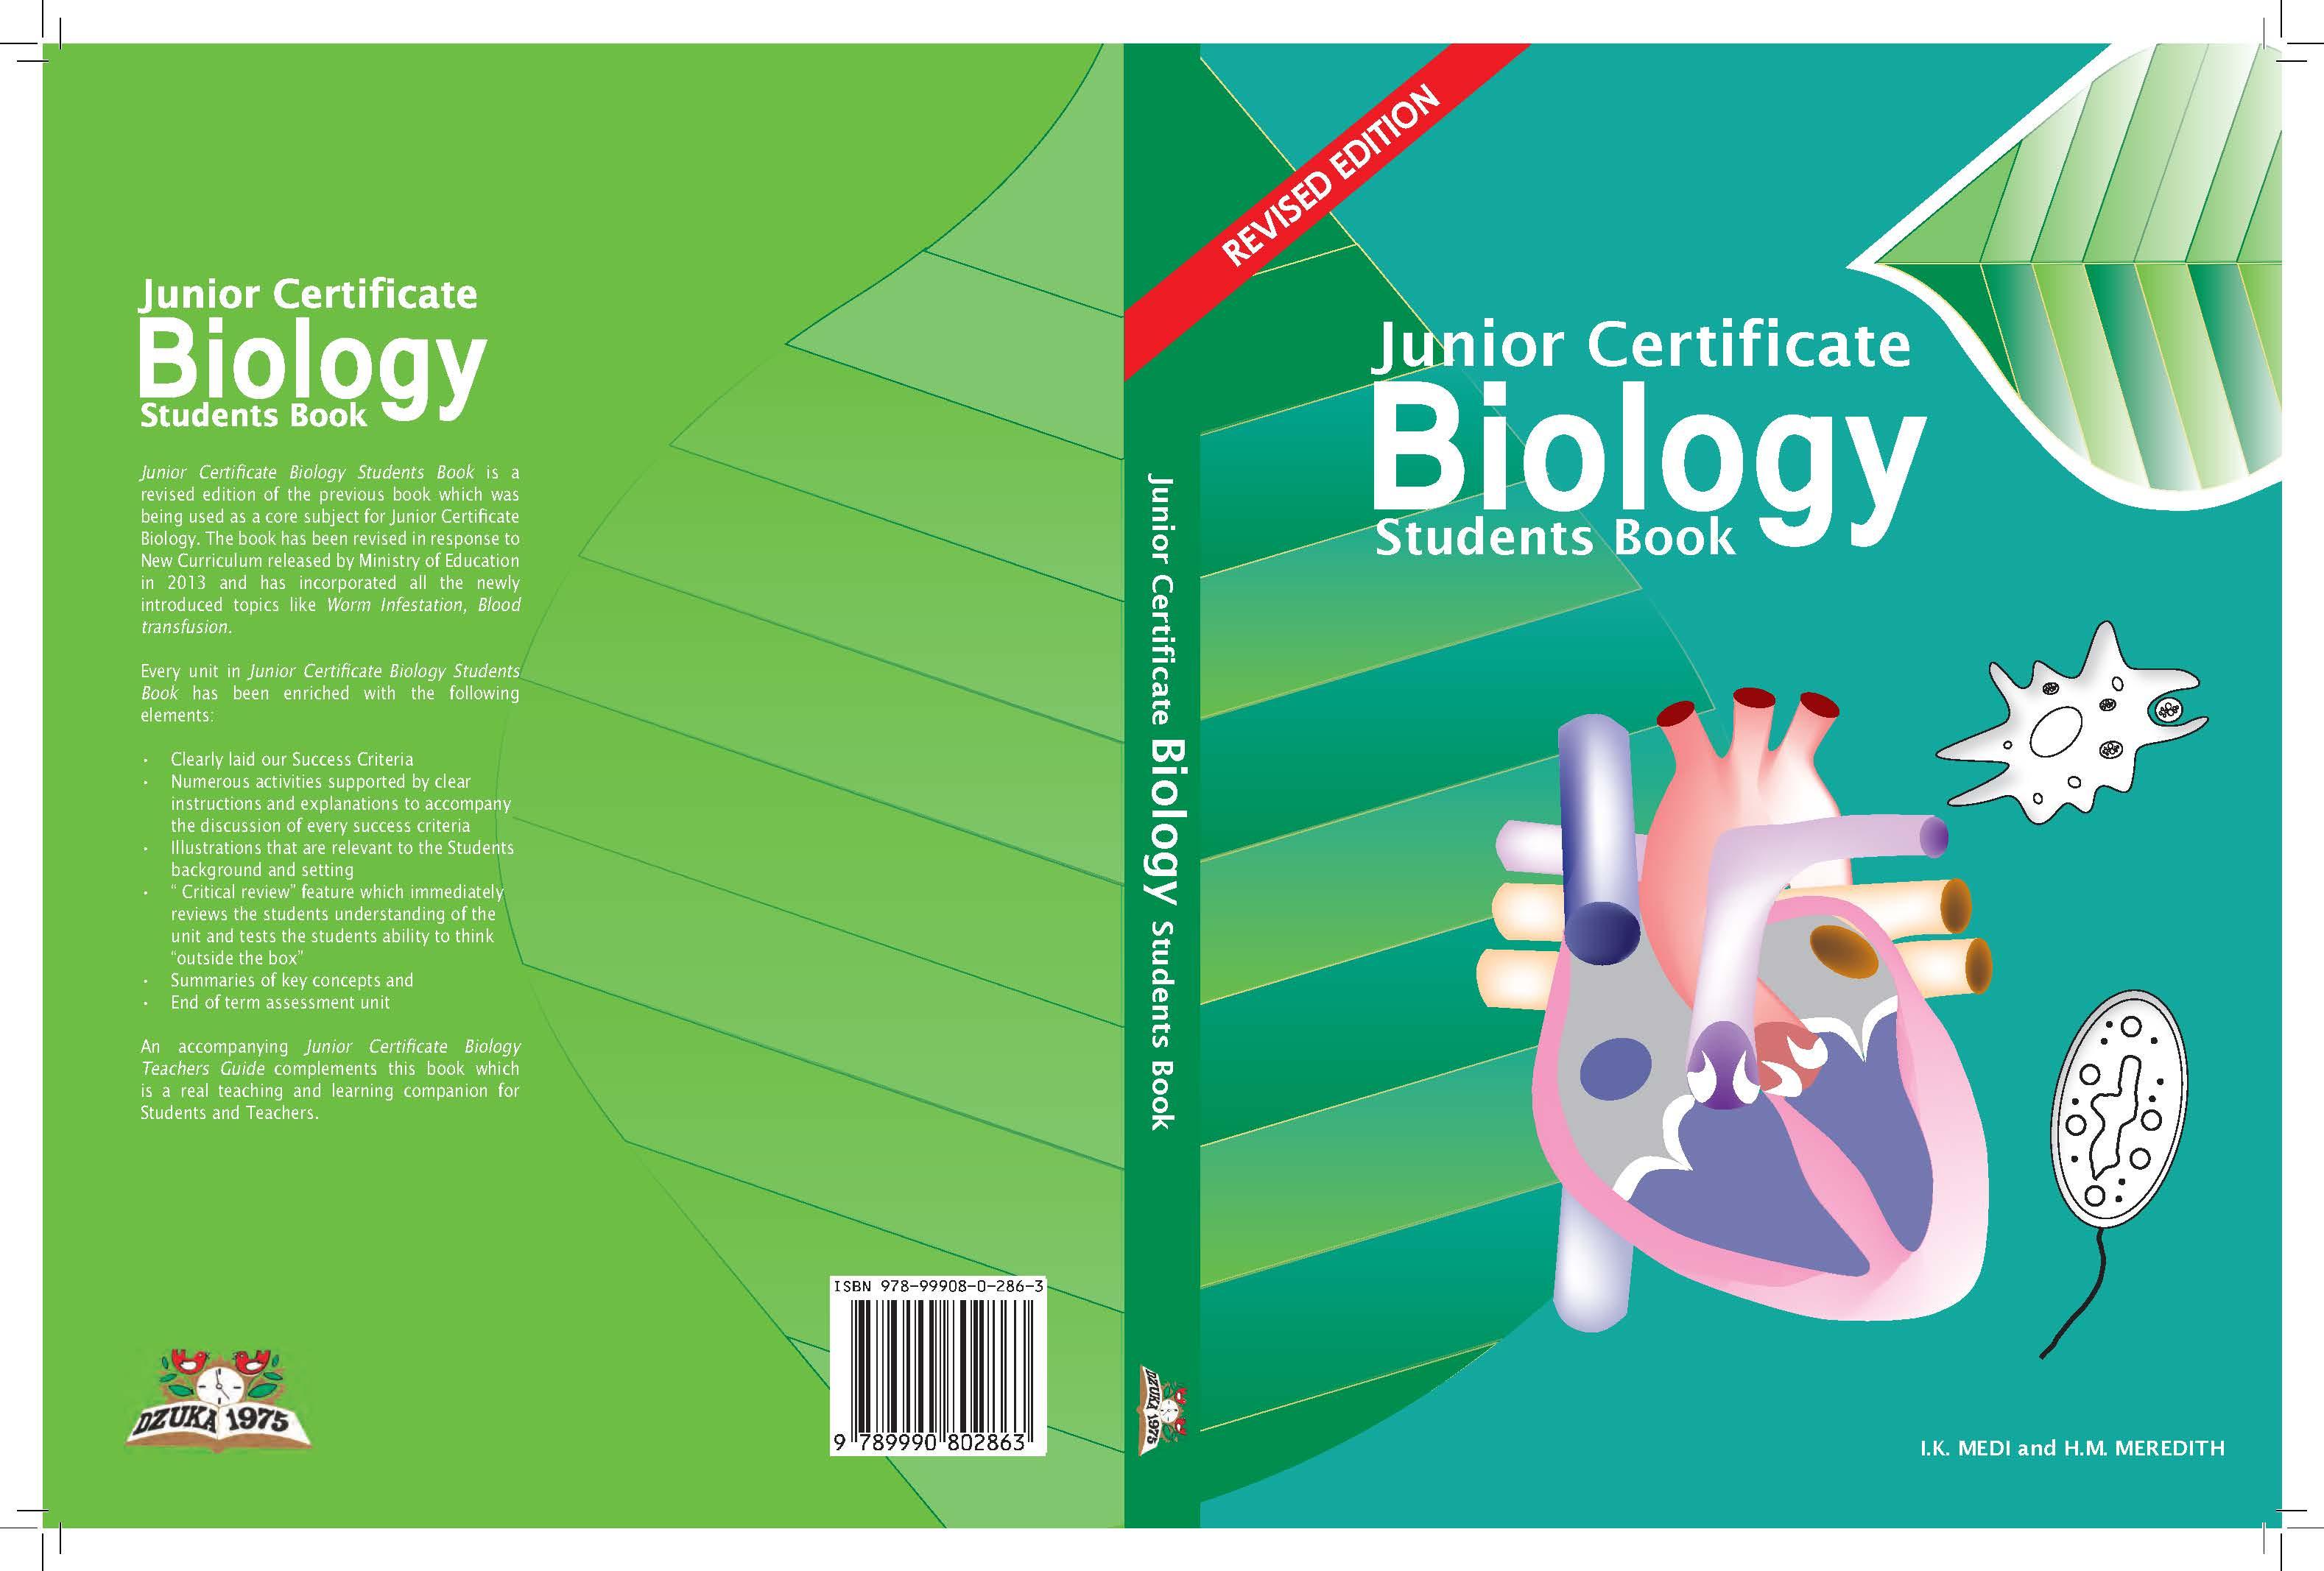 JUNIOR-BIOLOGY-COVER-23-April.p1